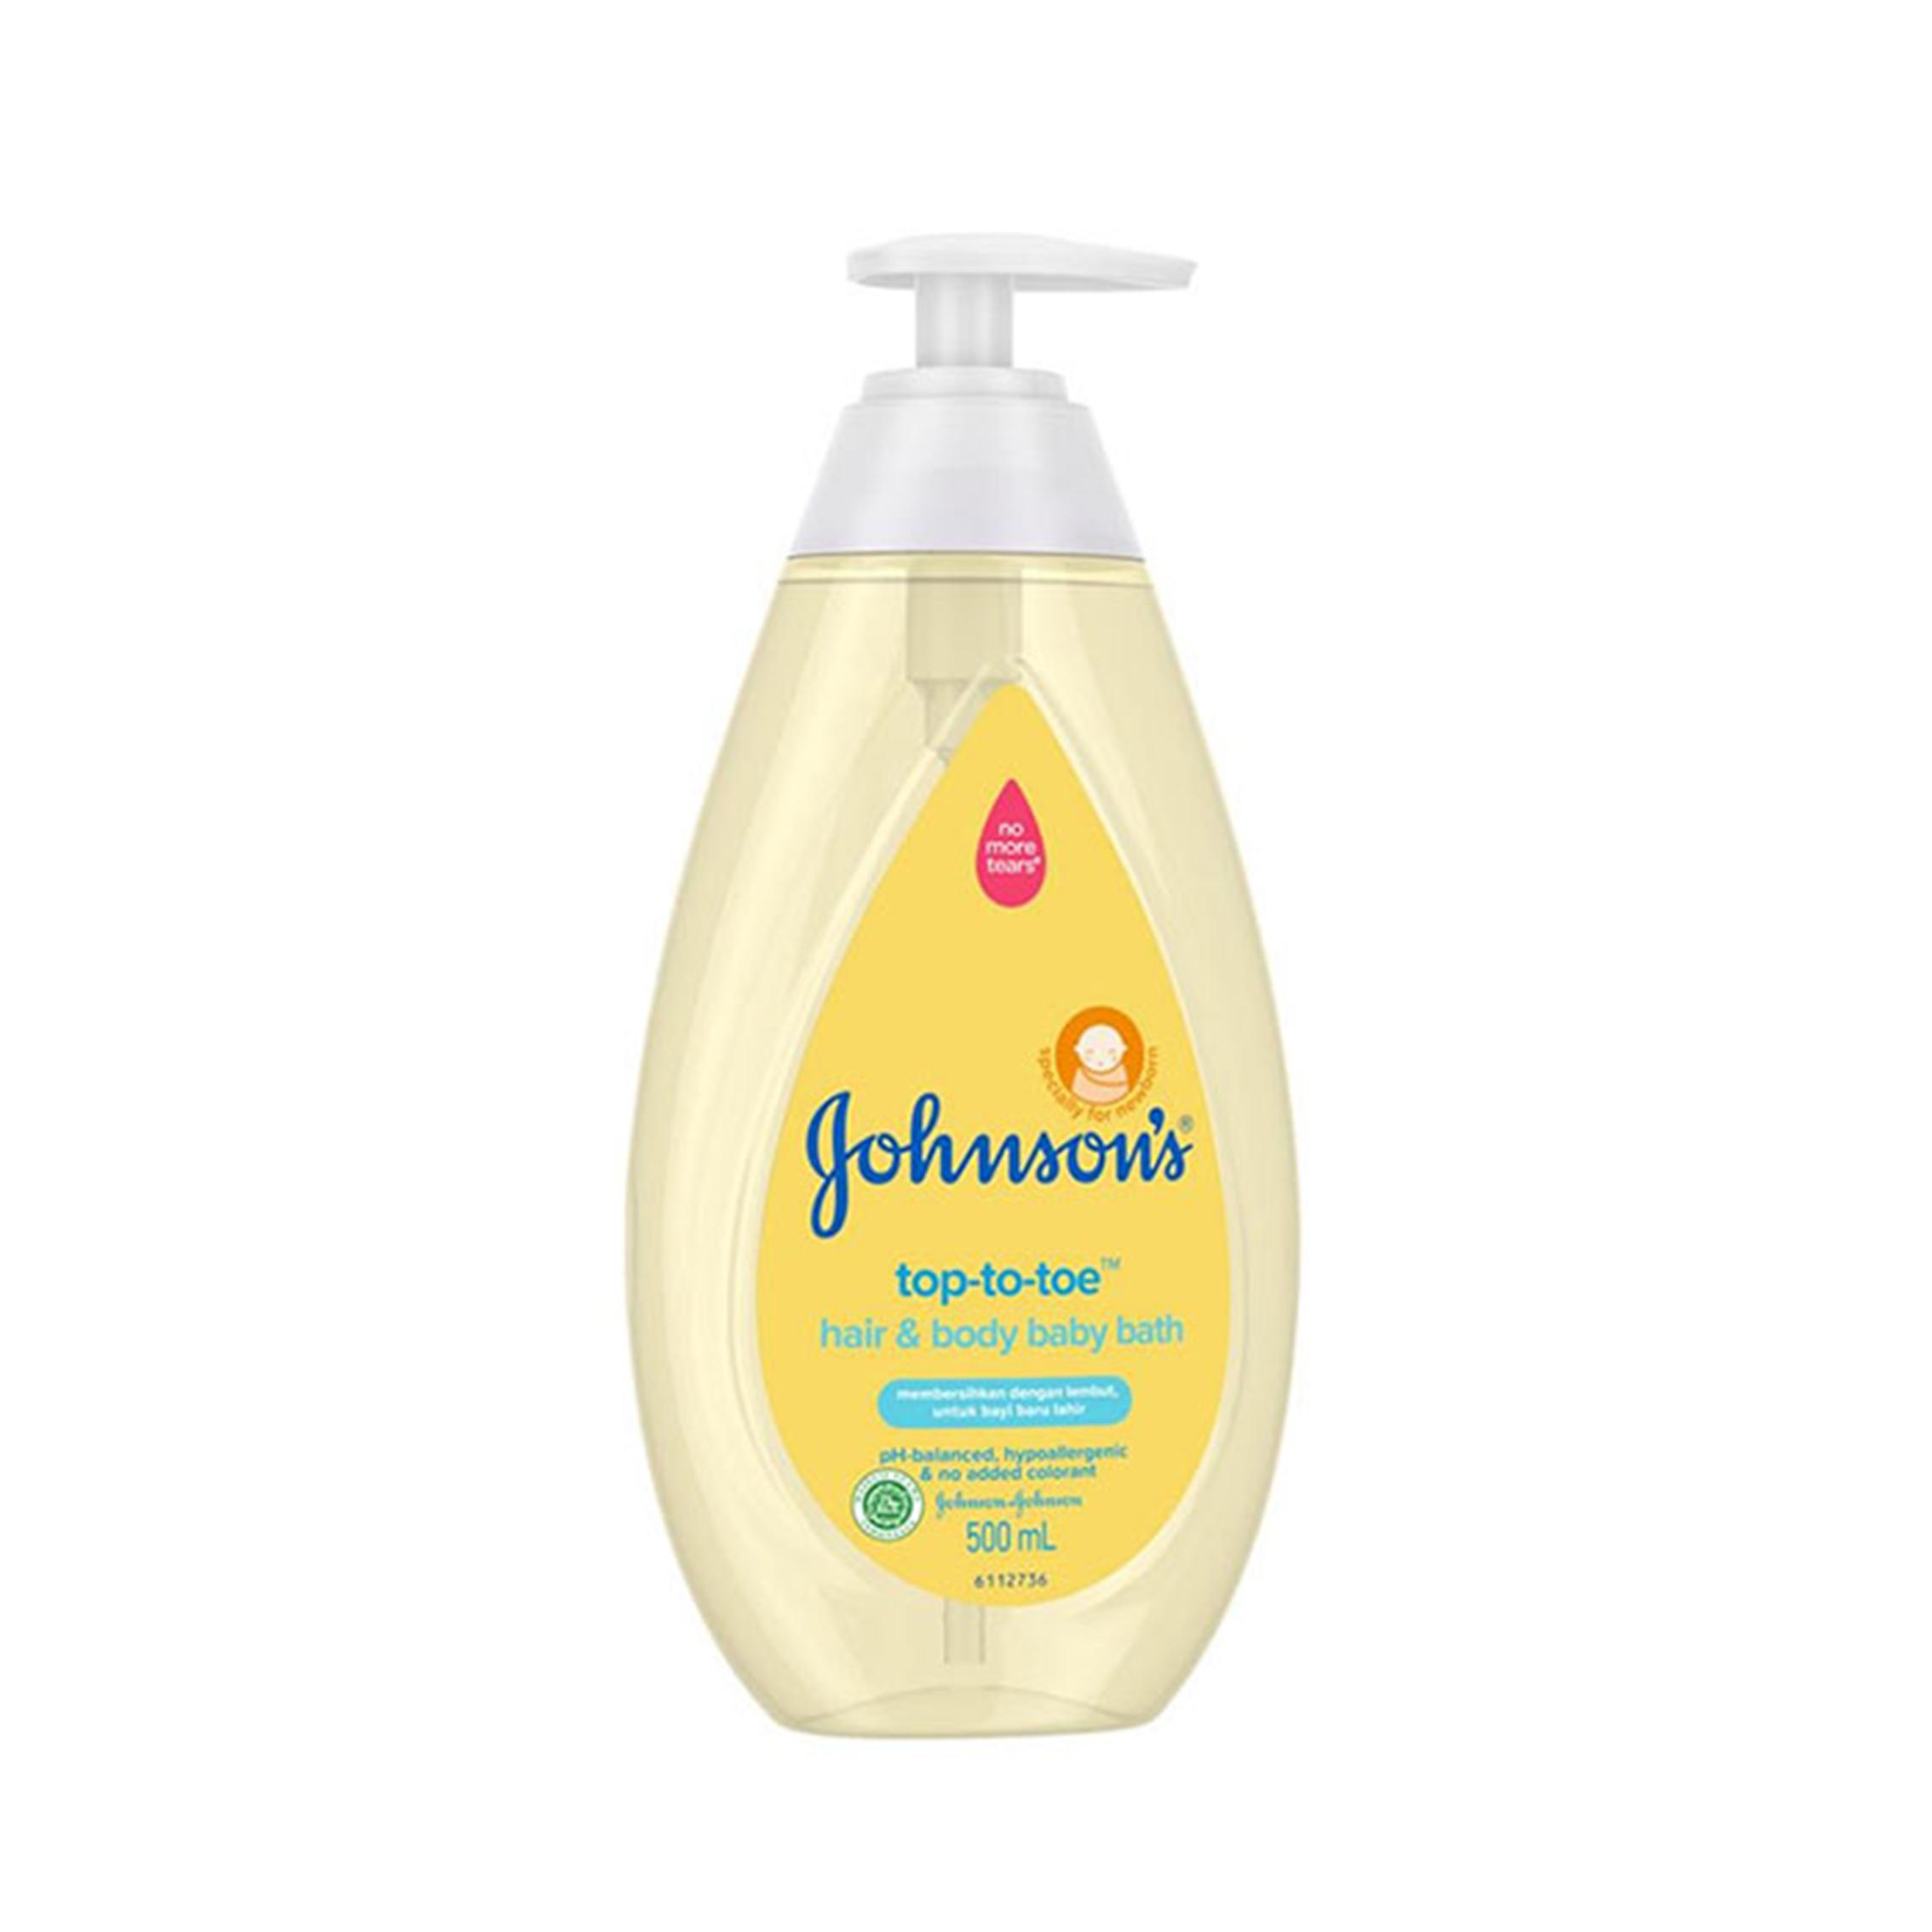 one gallery picture for [JOHNSONS] Top to Toe Hair & Body Bath 500 ml  - Sabun Mandi Anak